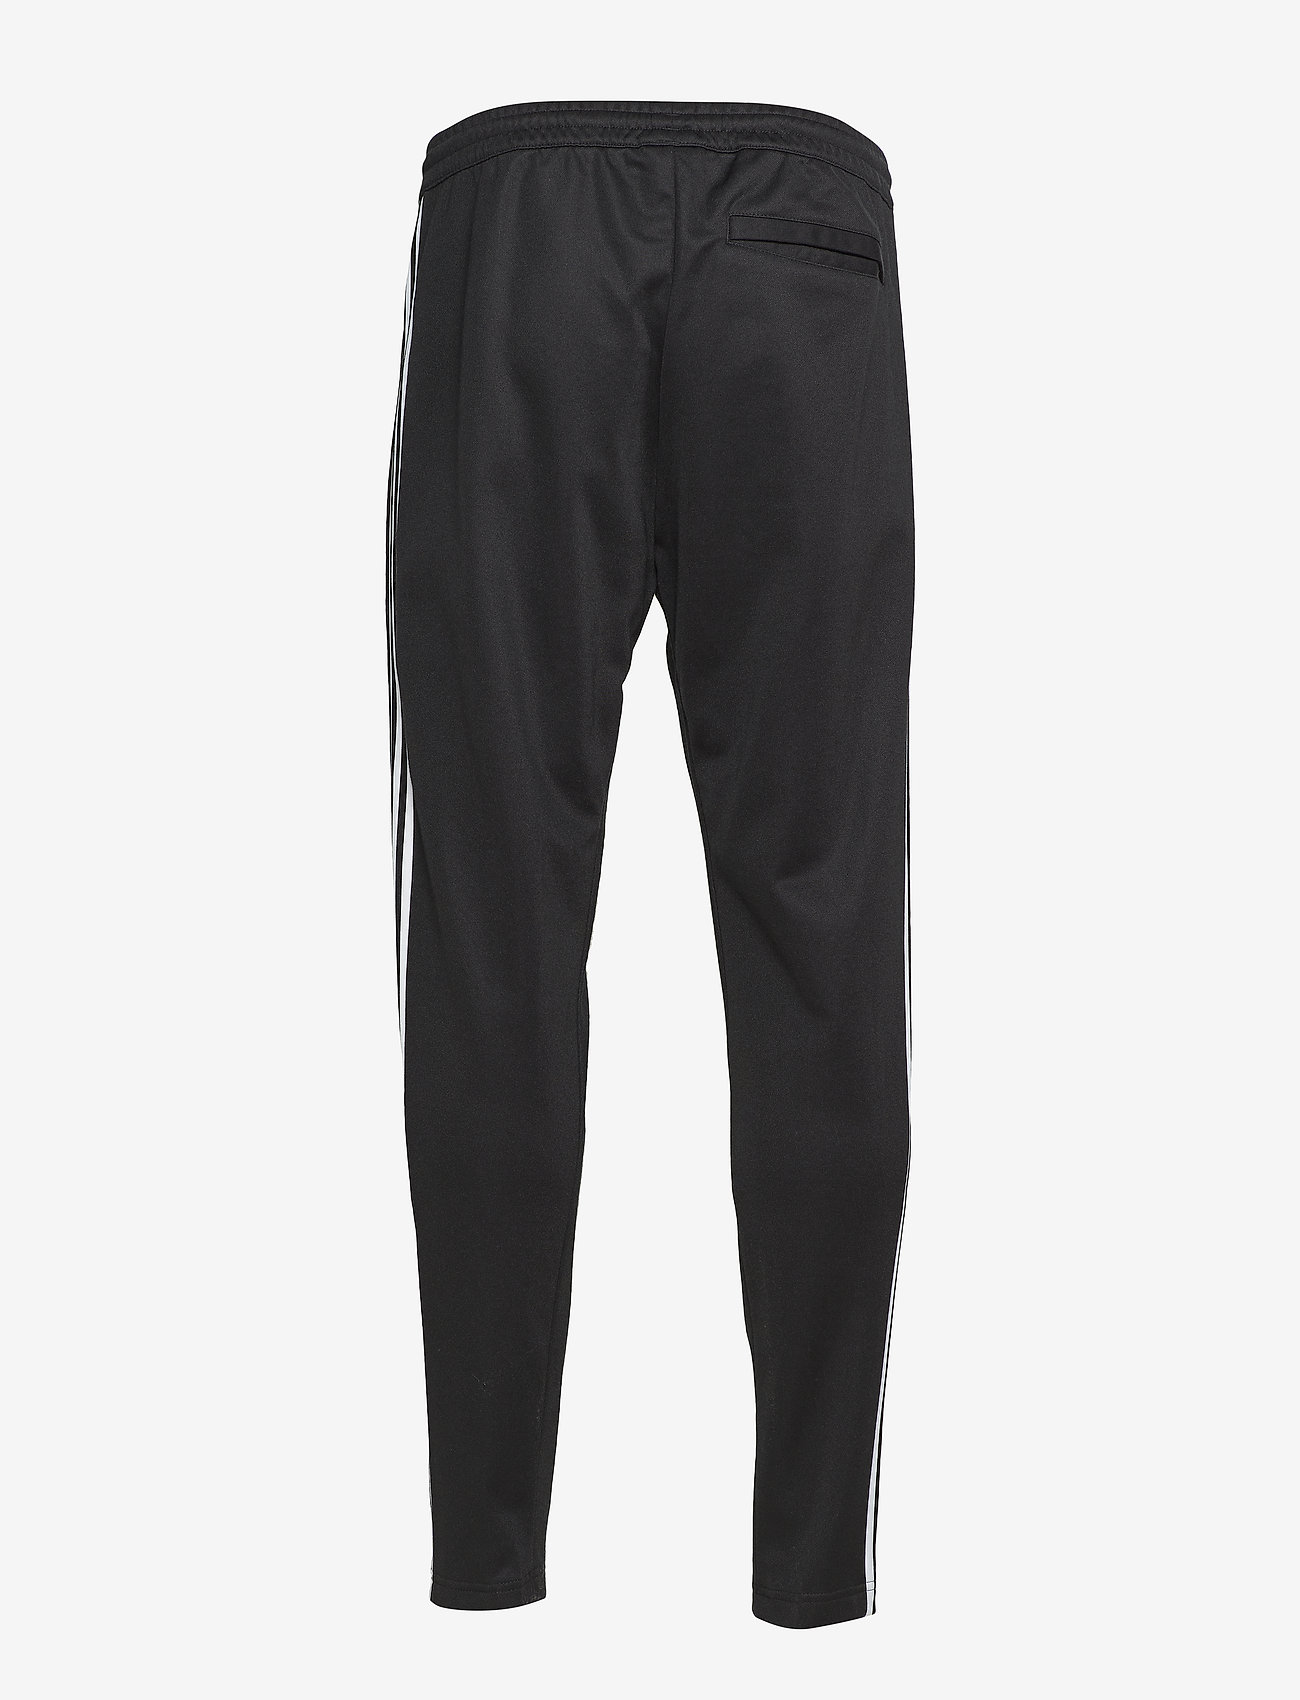 adidas Originals BECKENBAUER TP - Joggebukser BLACK - Menn Klær